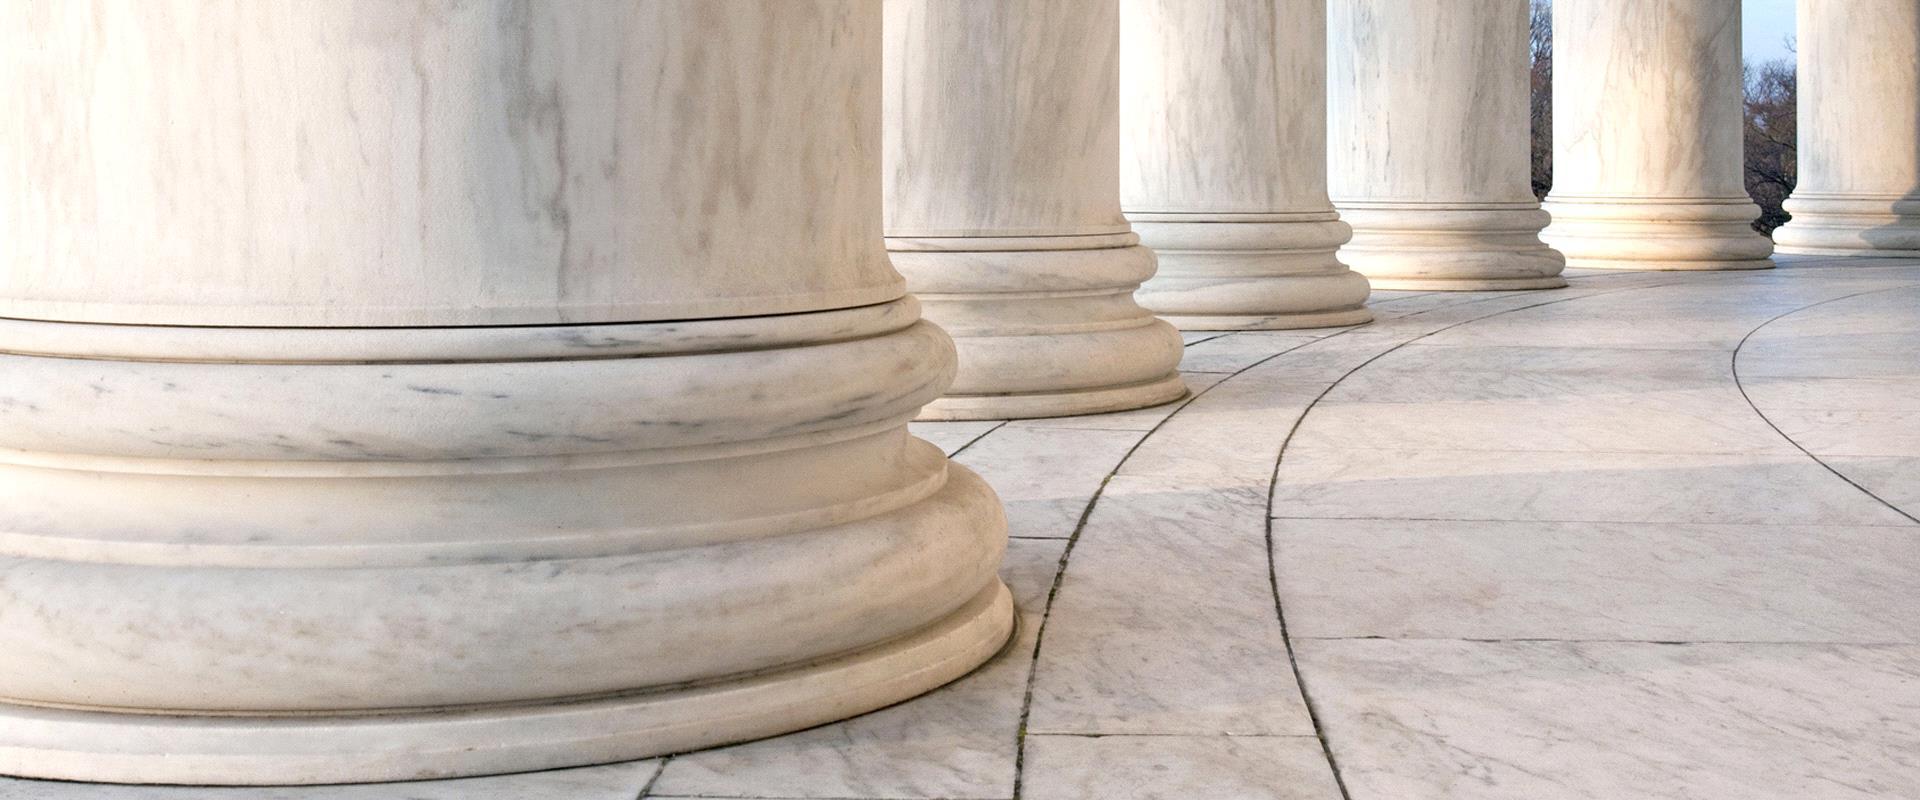 Productos qu micos para la piedra marmol pavimento cer mica for Articulos de ceramica